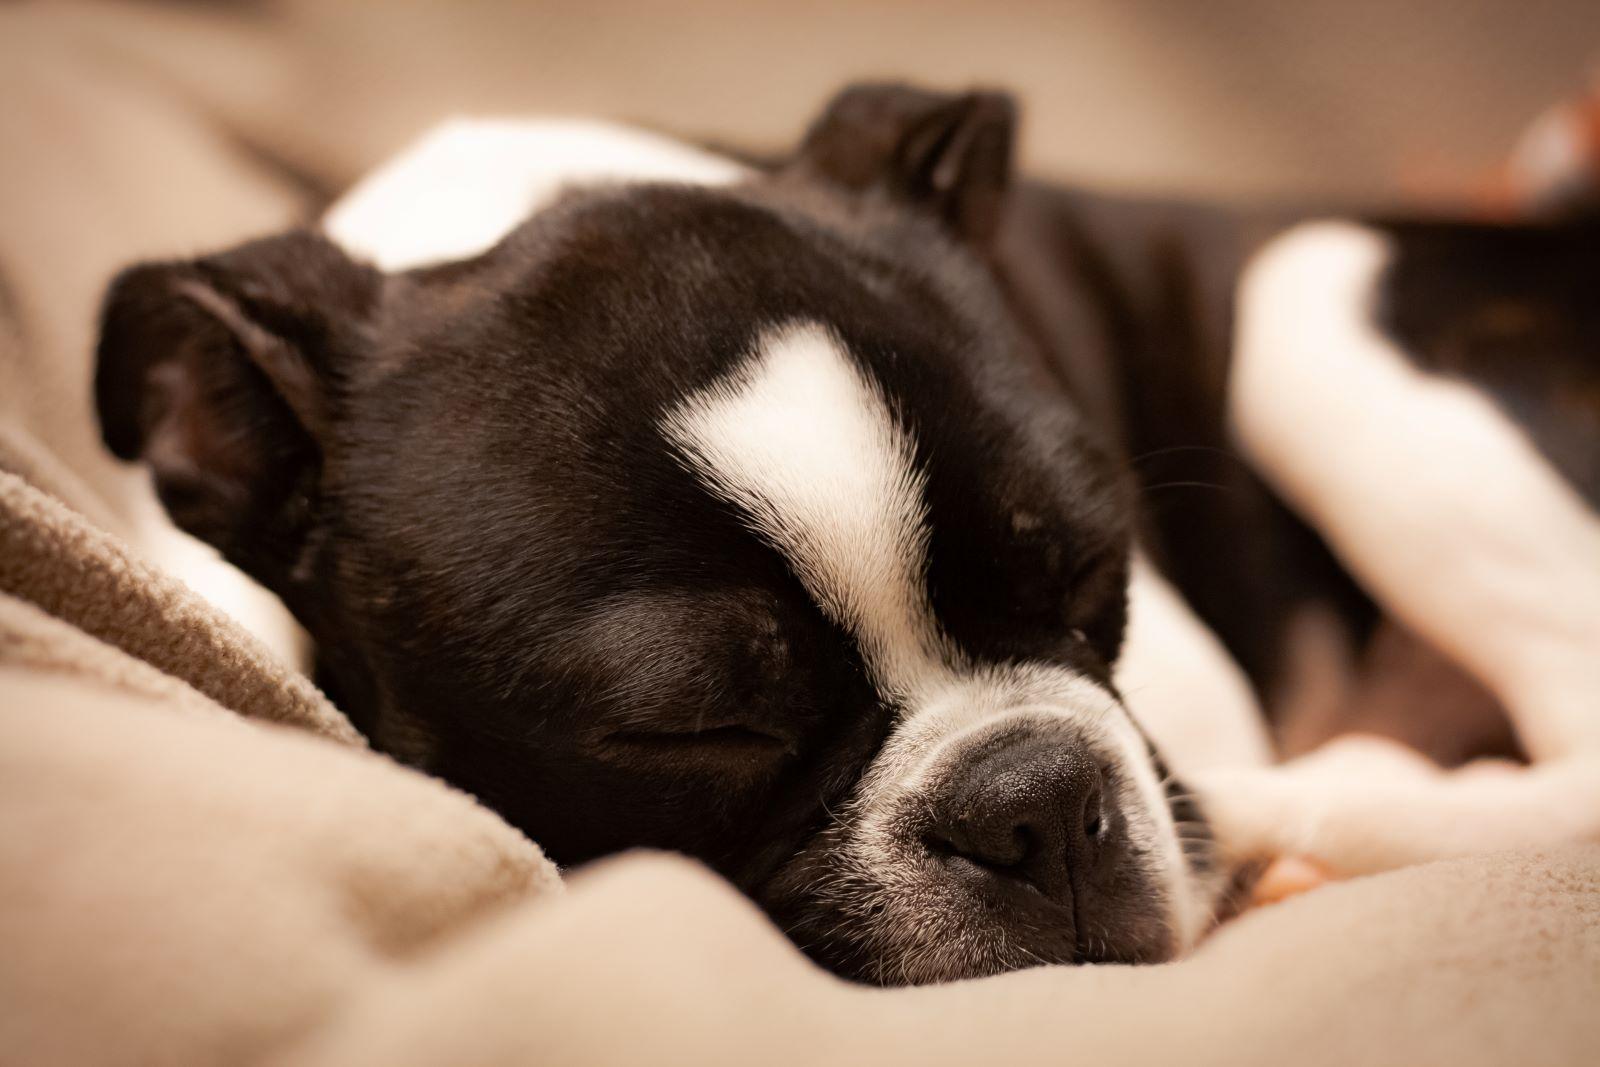 Sleeping Black and White Boston Terrier on a tan blanket